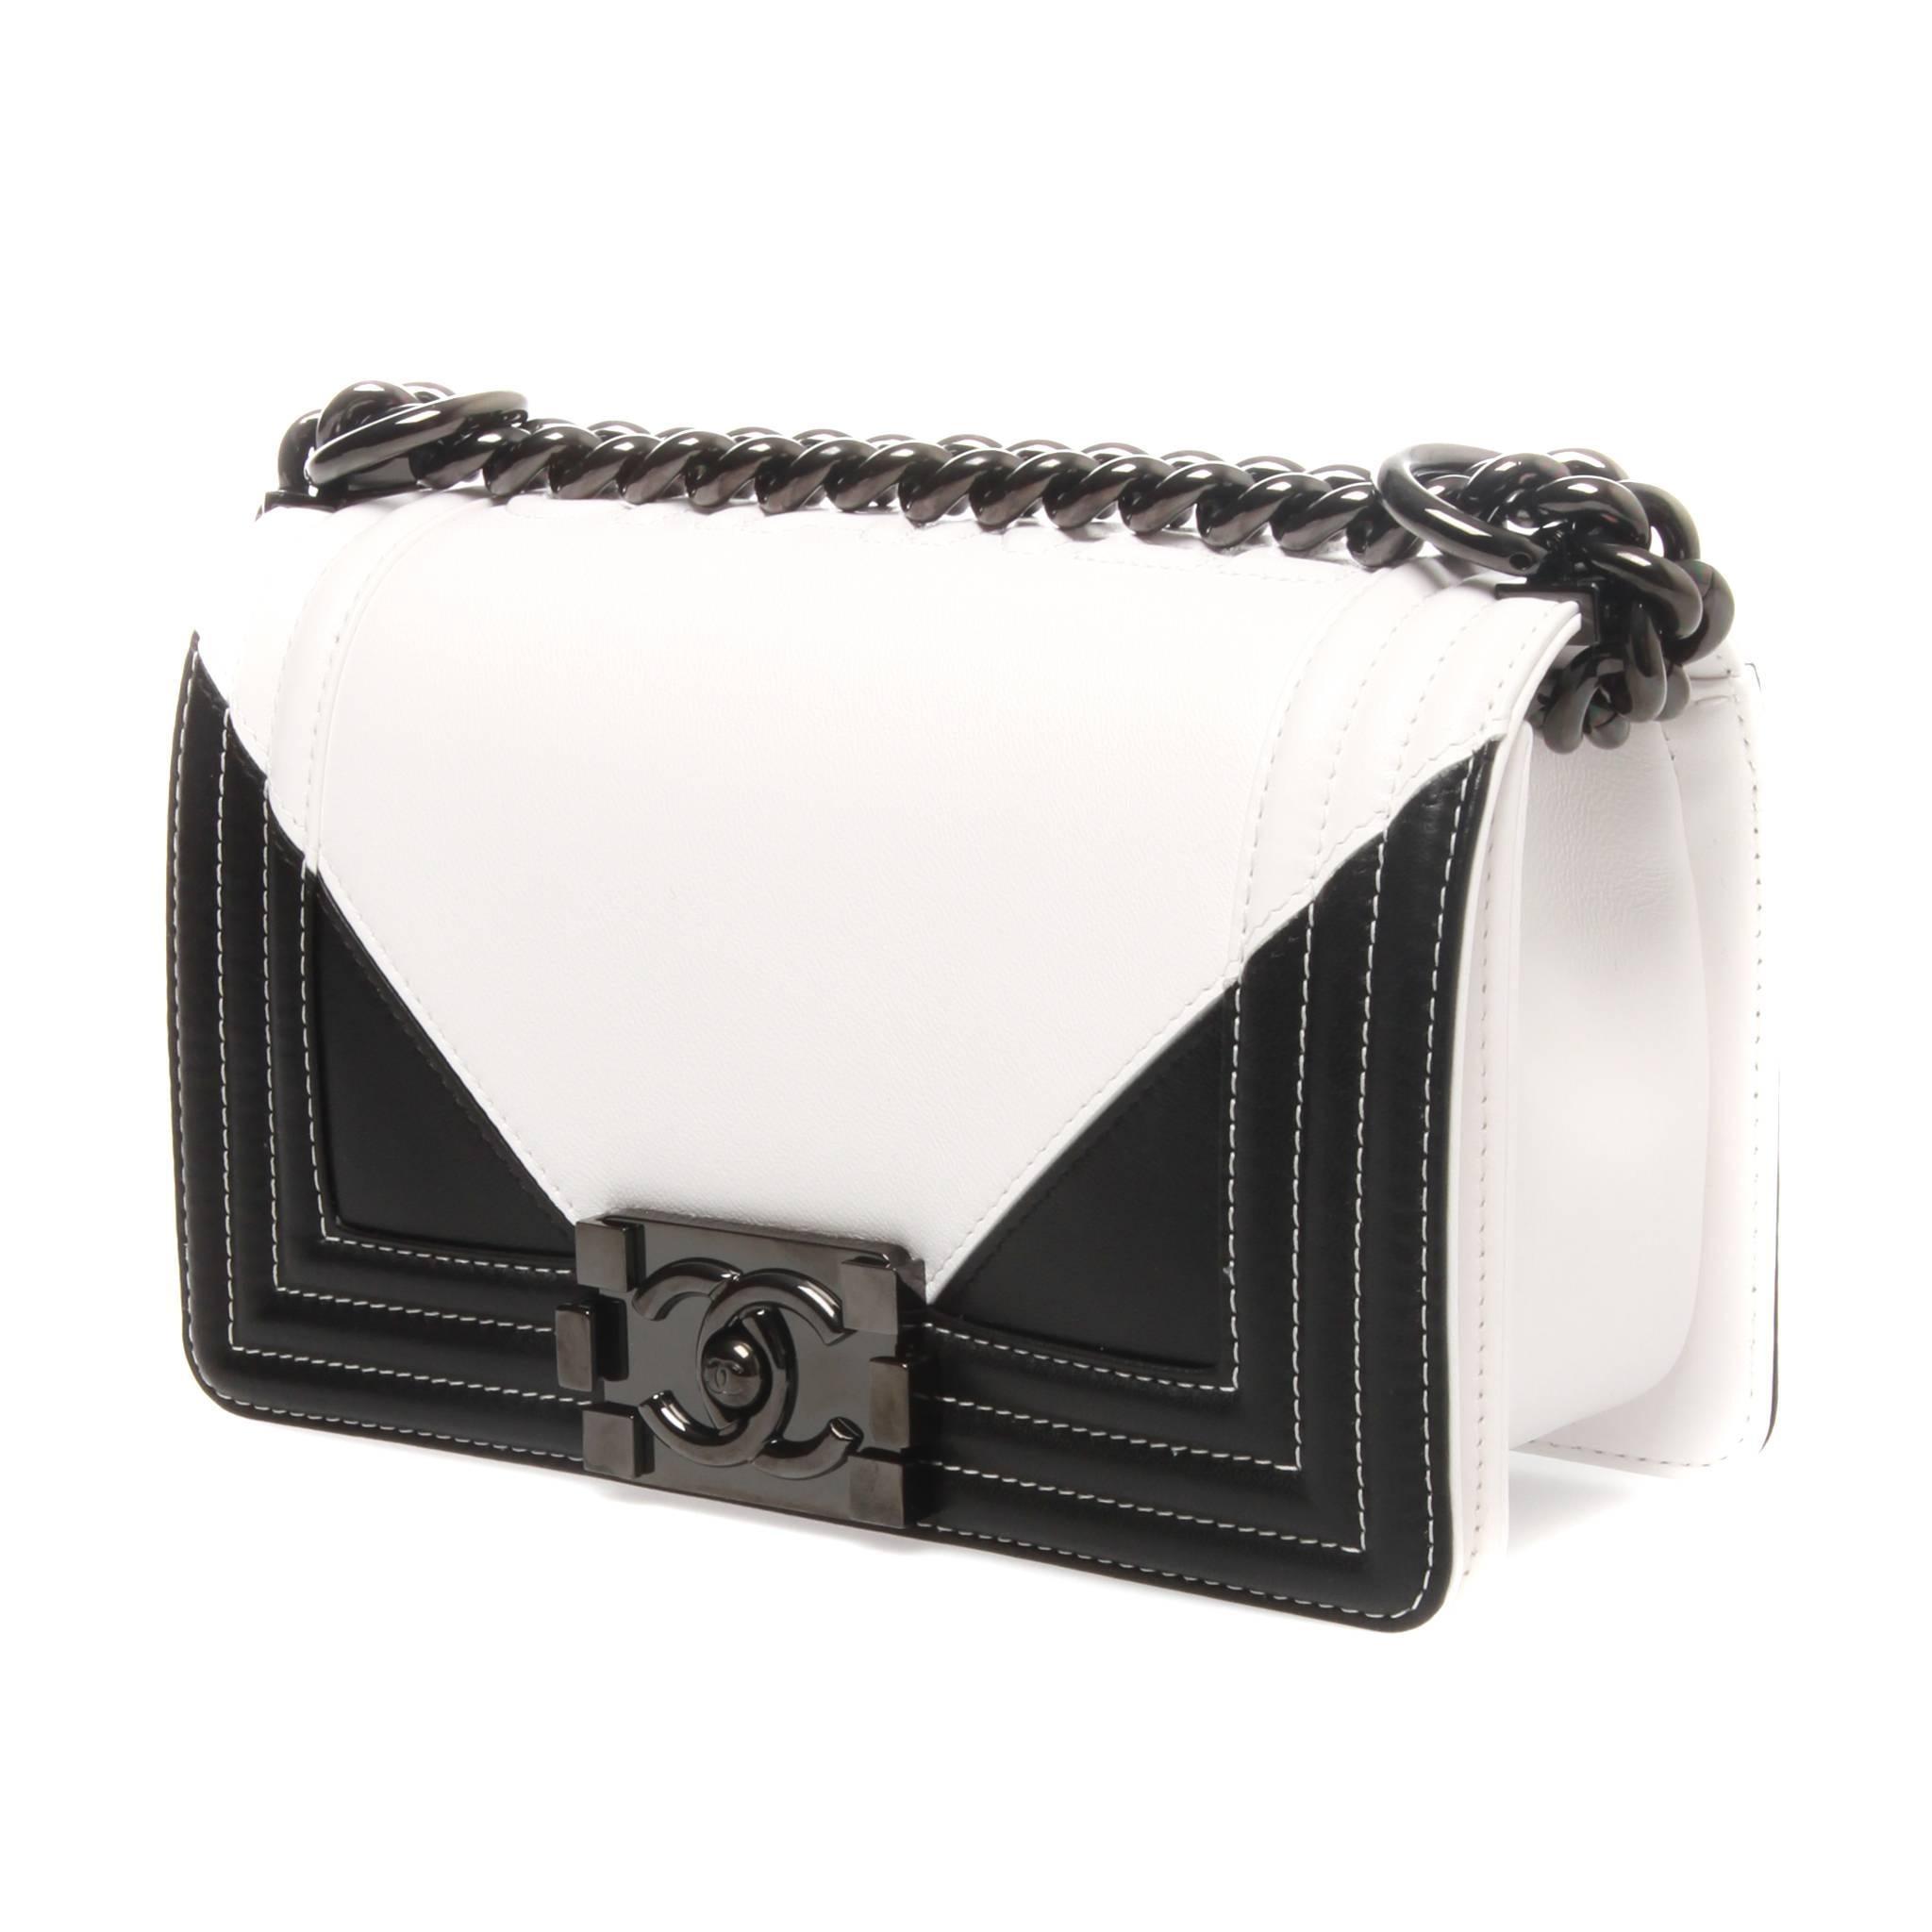 Chanel Black And White Geometric Lambskin Medium Boy Bag